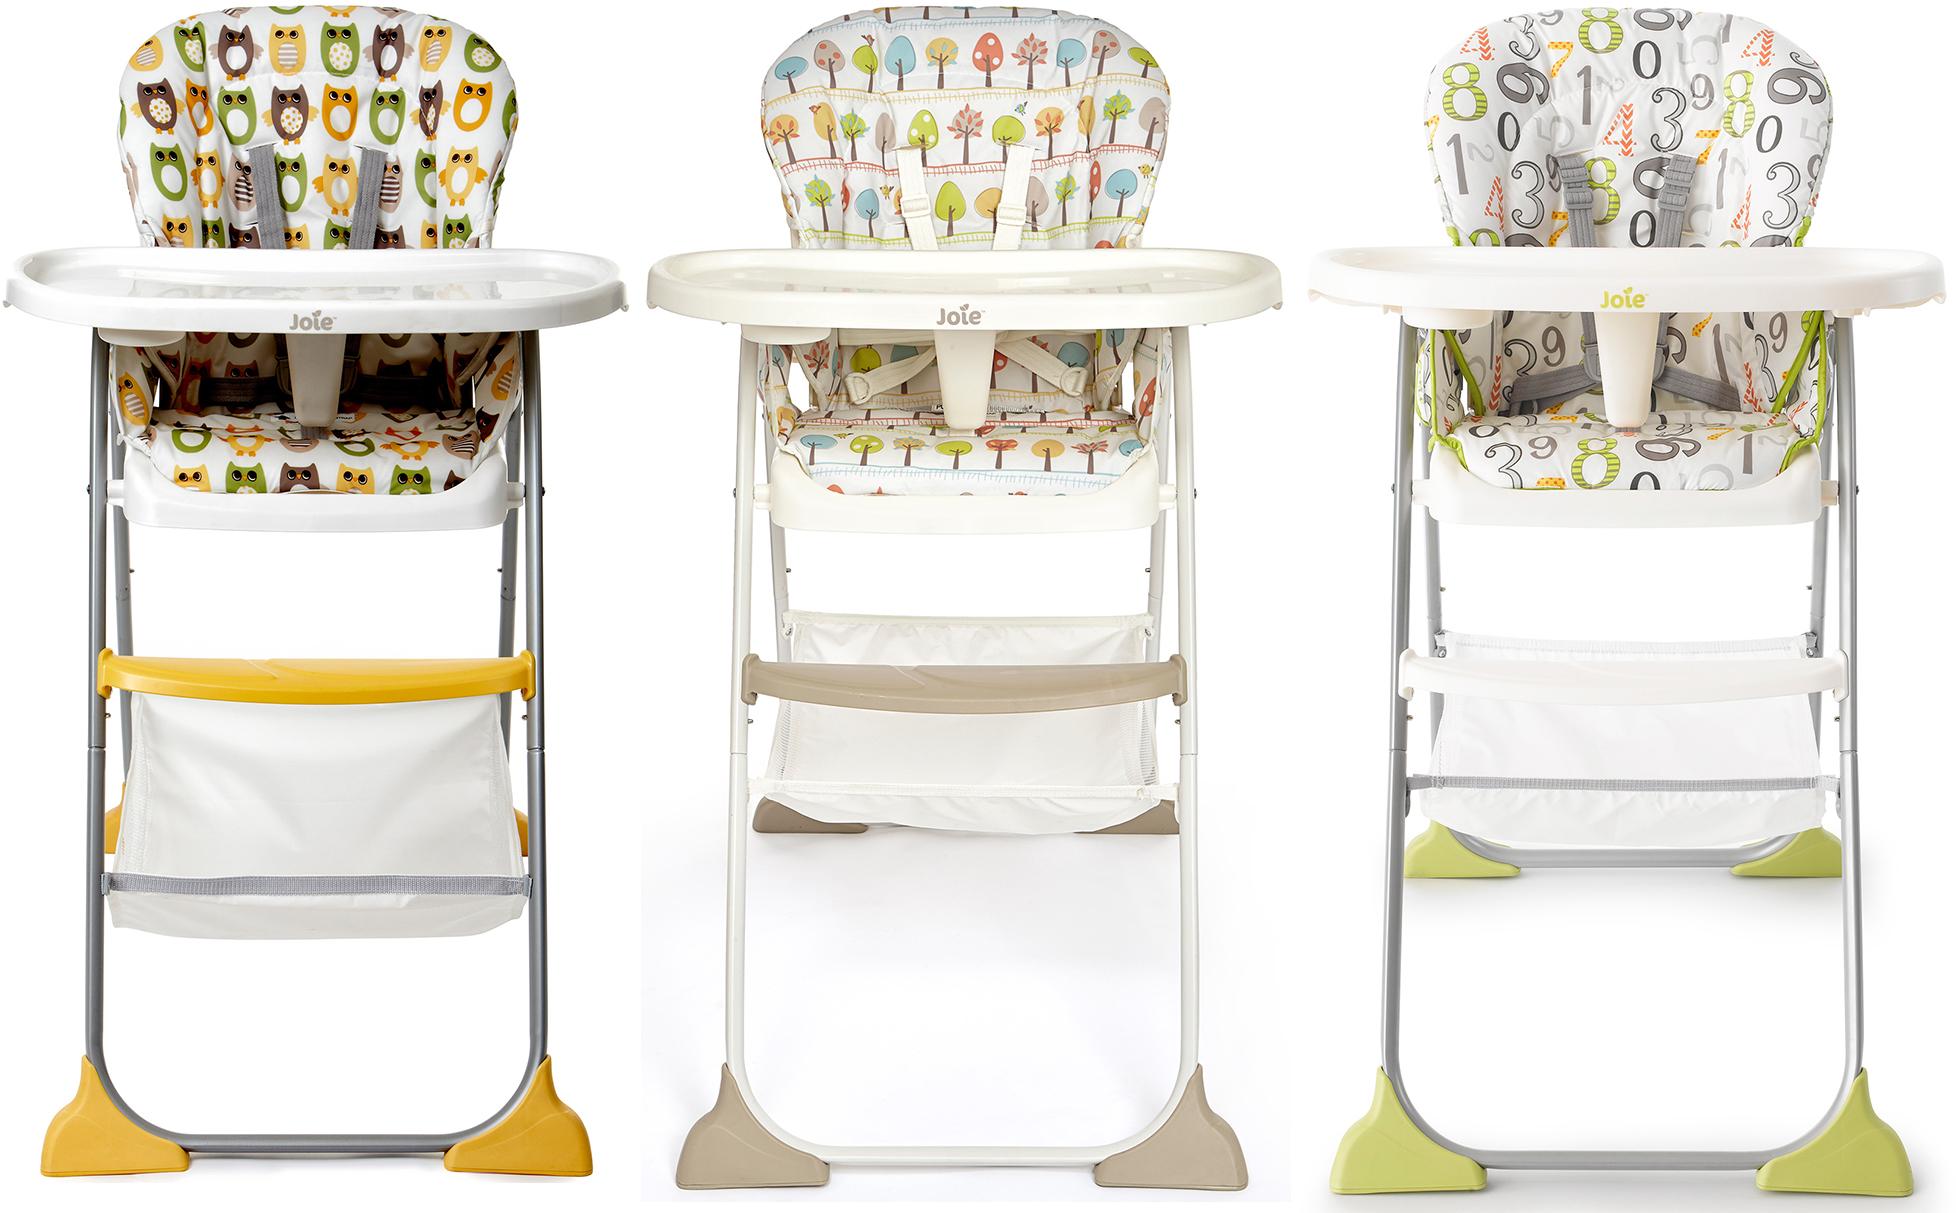 Joie Mimzy Snacker Highchair Lightweight Folding Toddler Baby